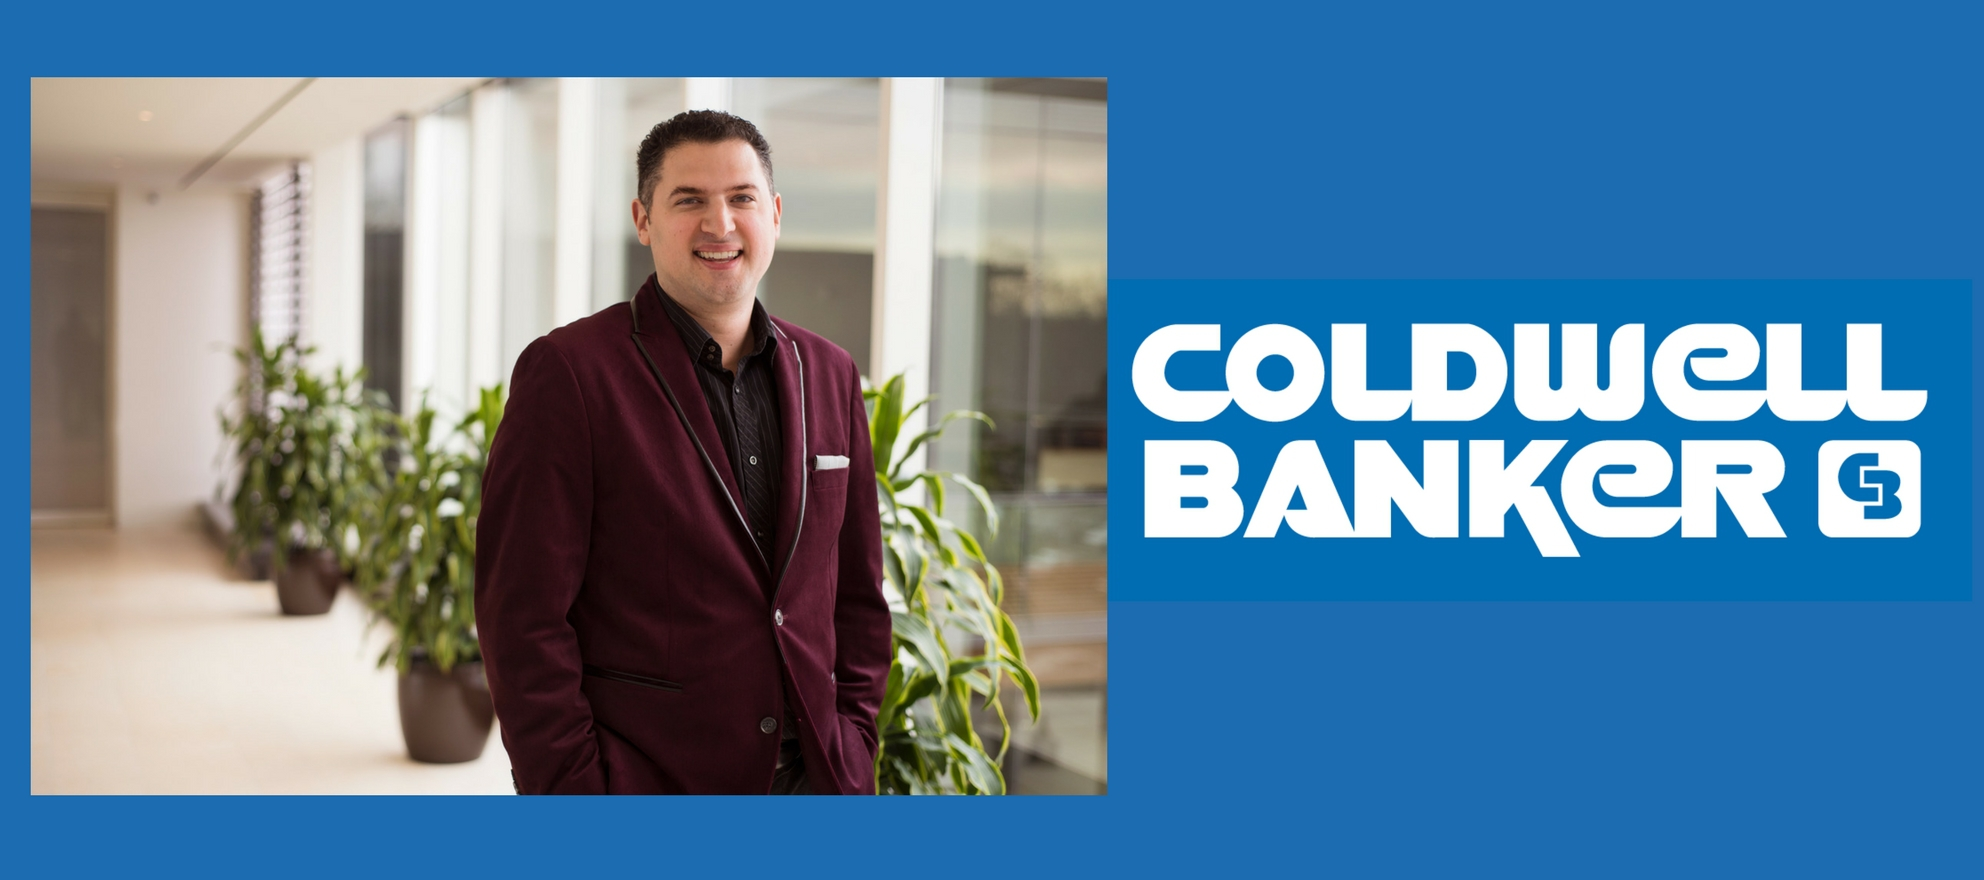 david marine coldwell banker svp marketing